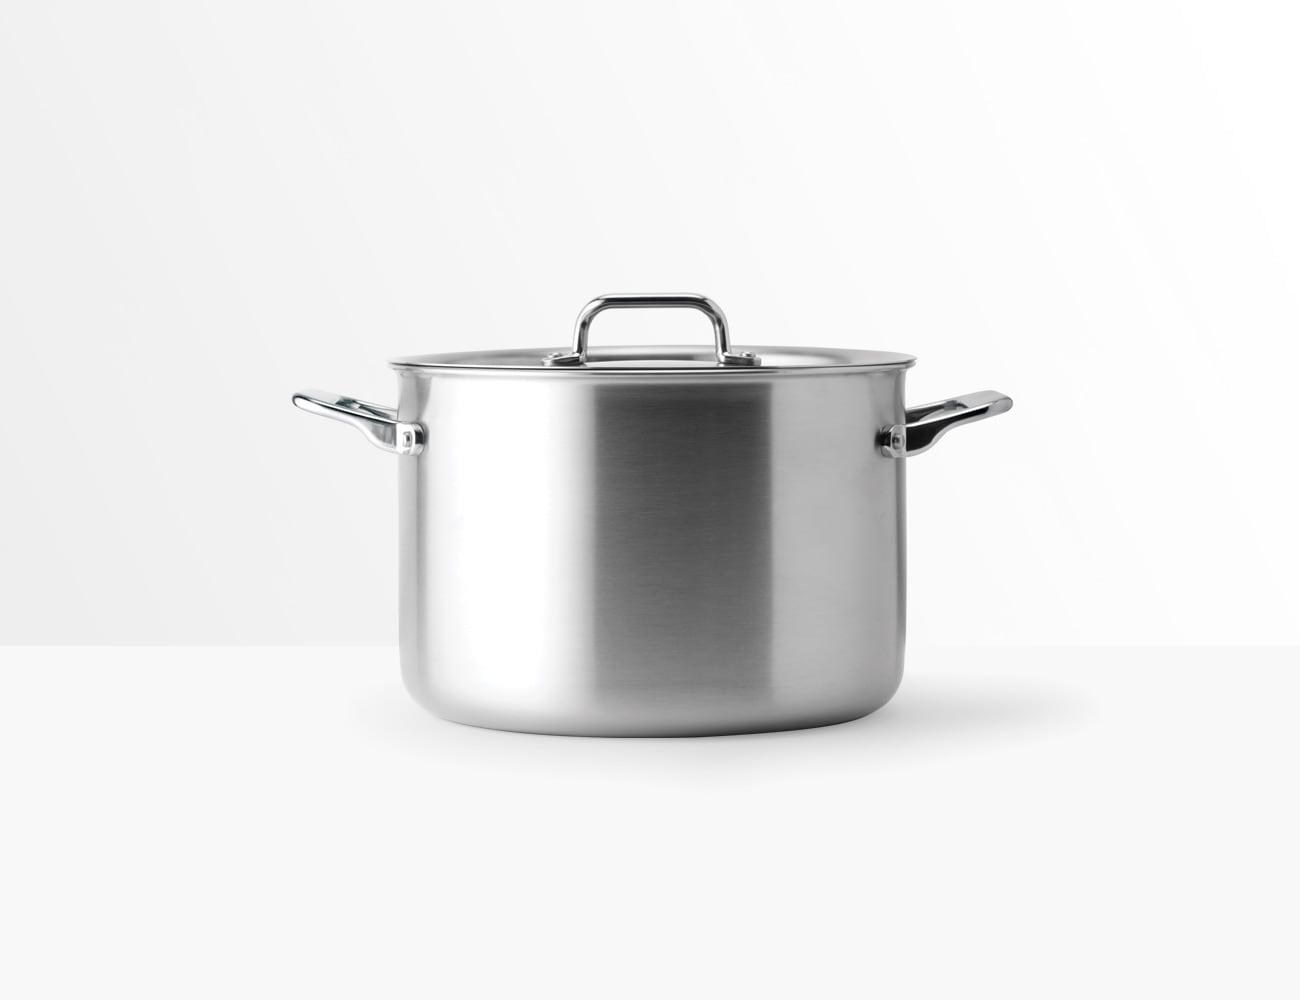 Misen Premium Stainless Steel Cookware